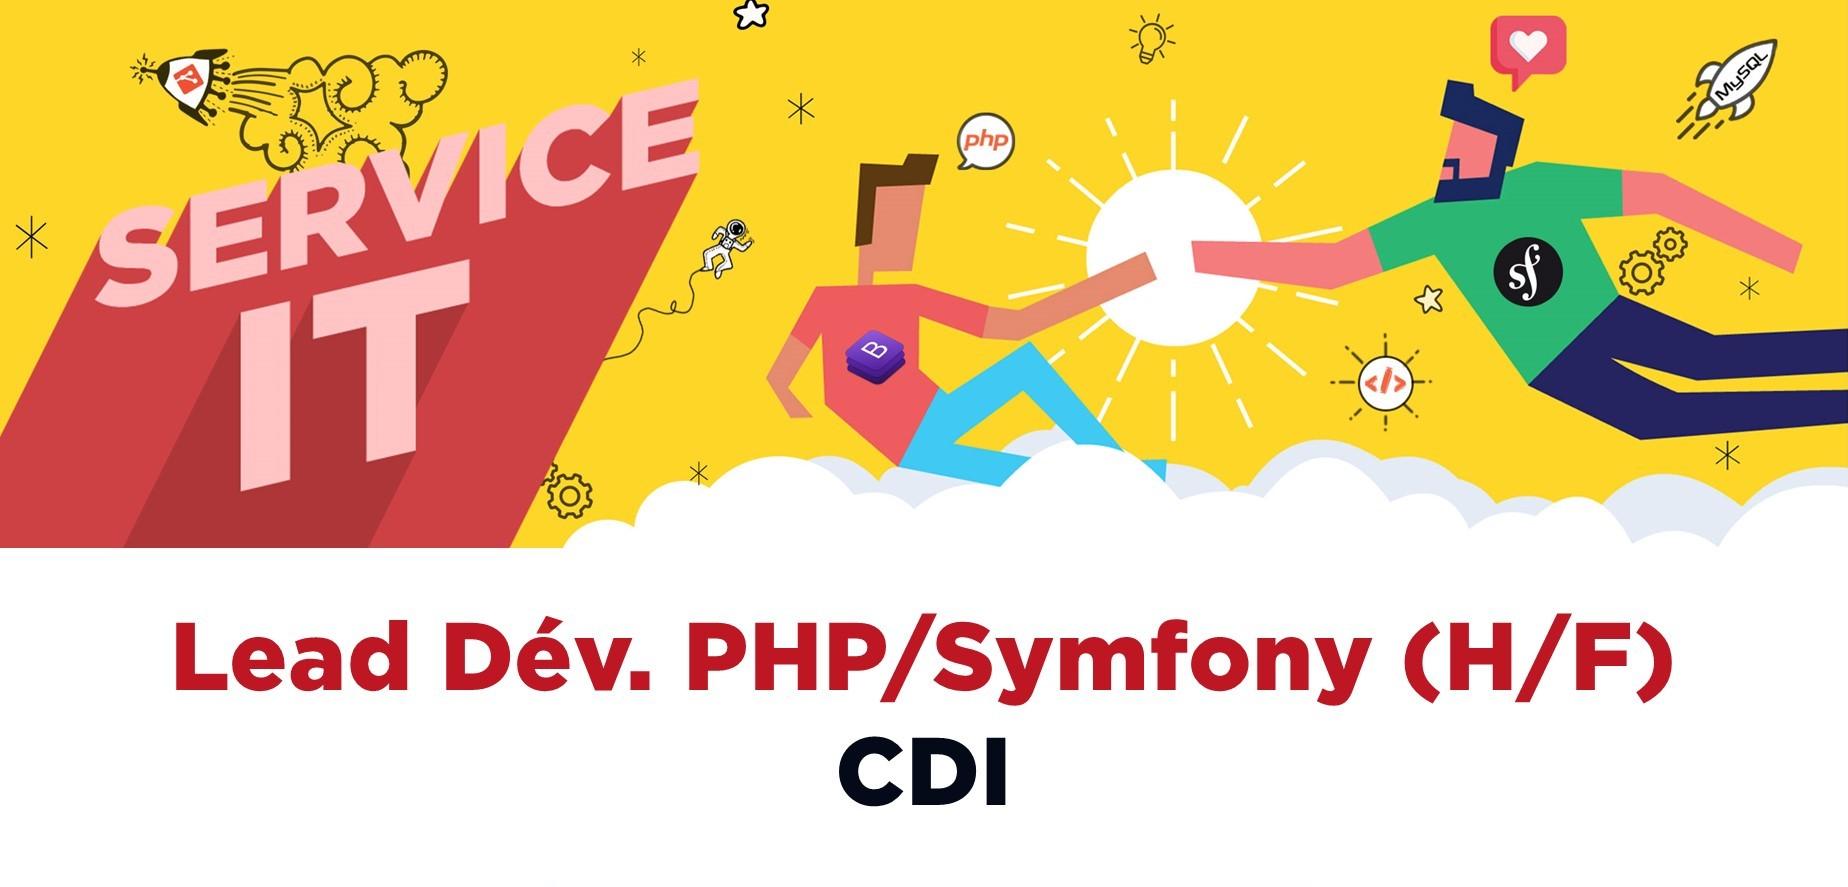 Lead Dév. PHP/Symfony